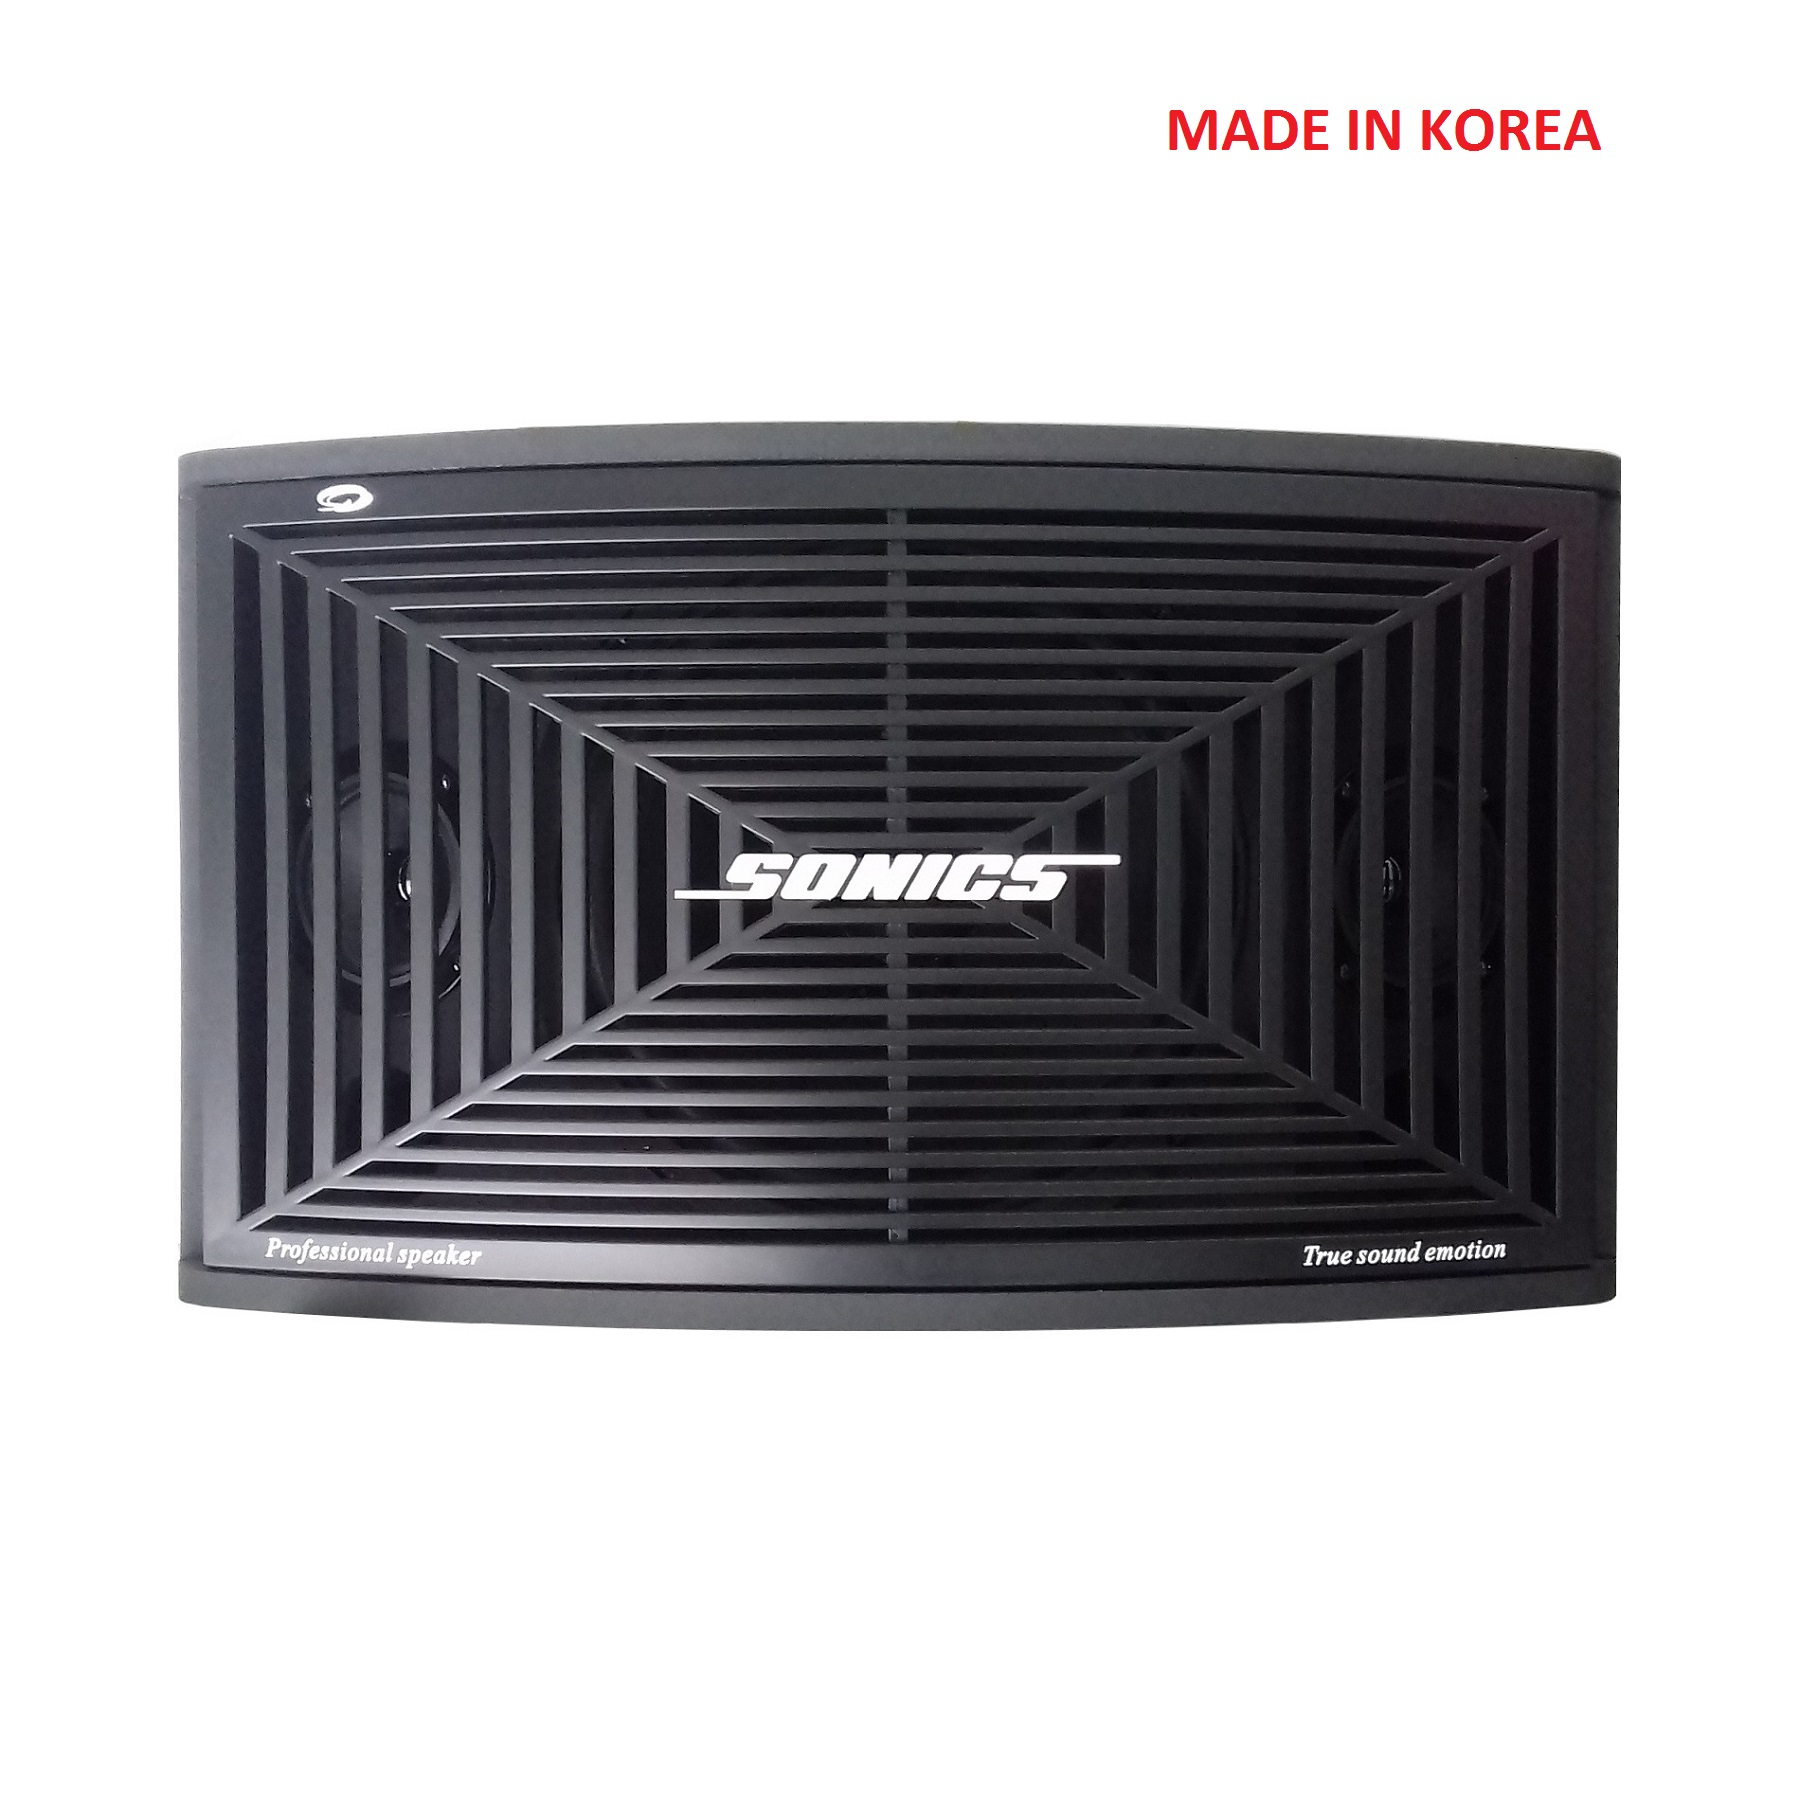 Loa Karaoke SONICS PS-A200. Hàng nhập khẩu. MADE IN KOREA